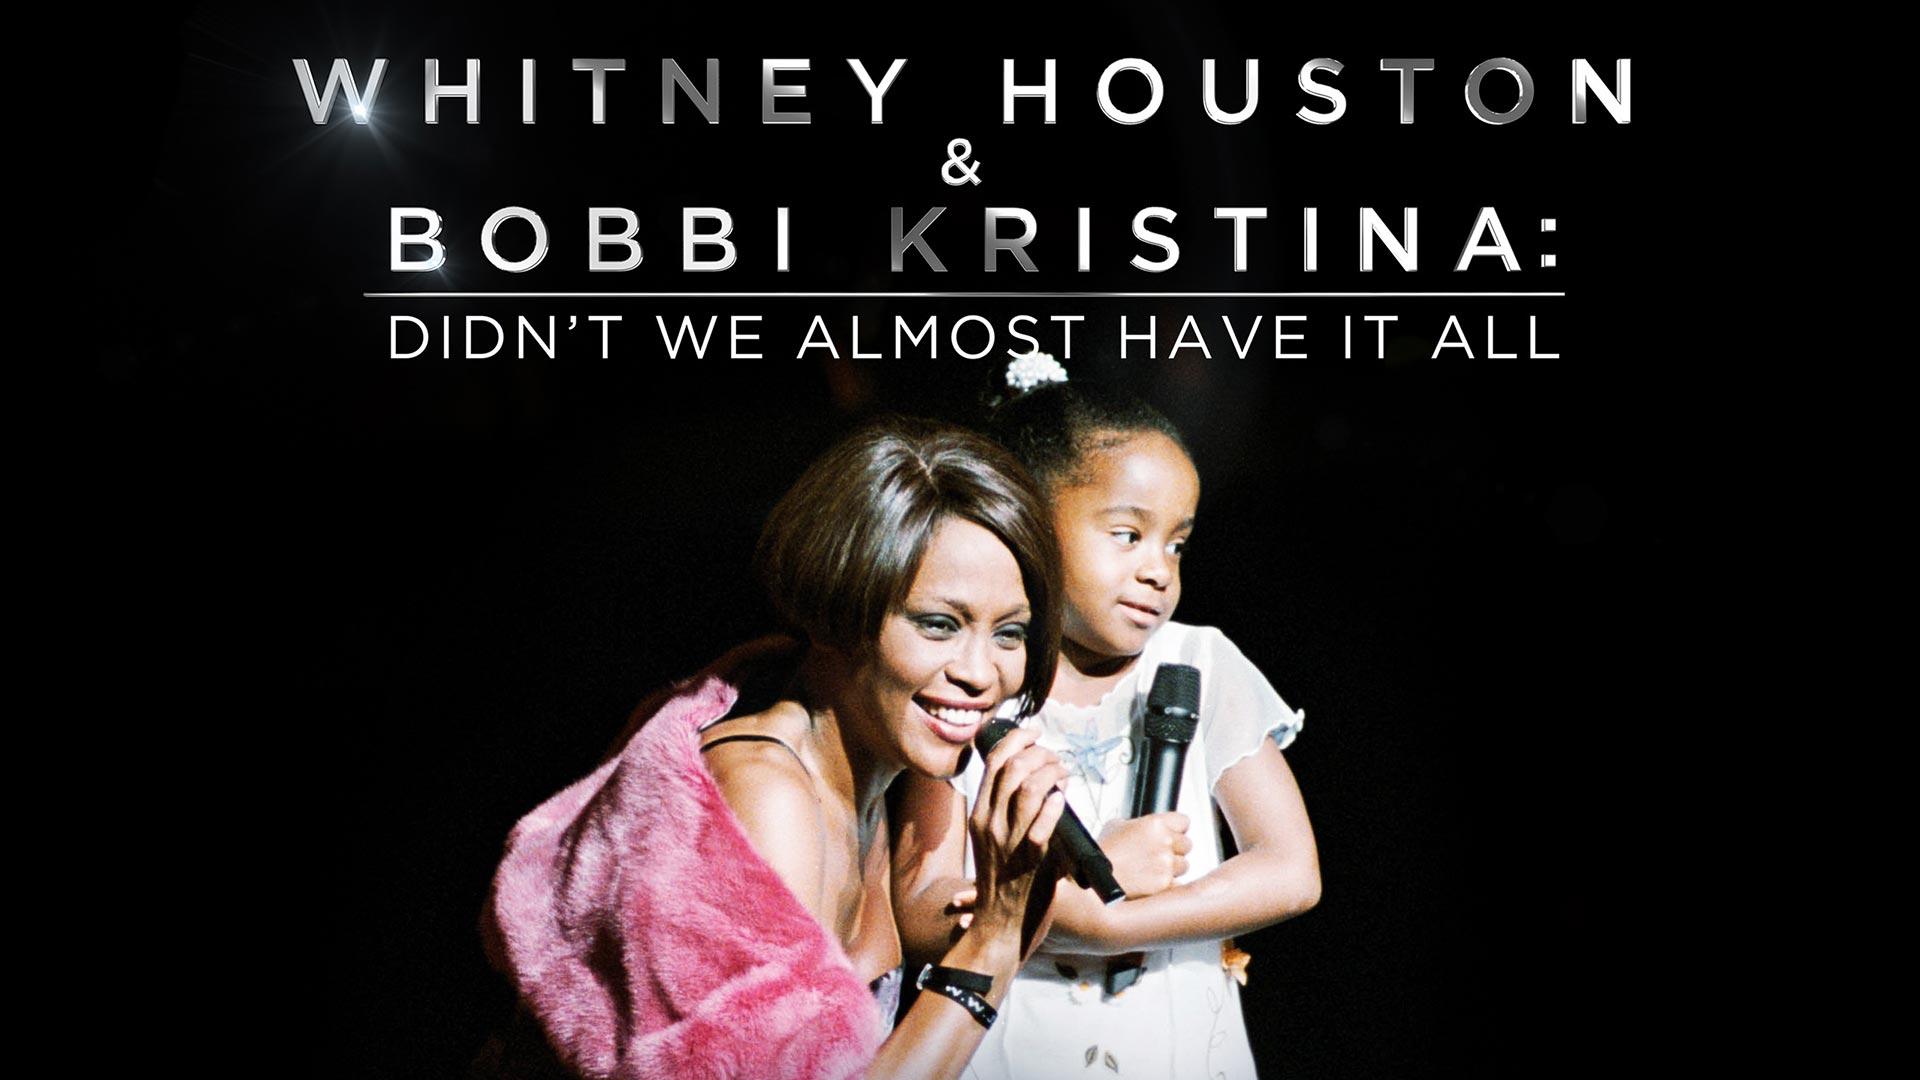 Whitney Houston & Bobbi Kristina: Didn't We Almost Have It All Season 1